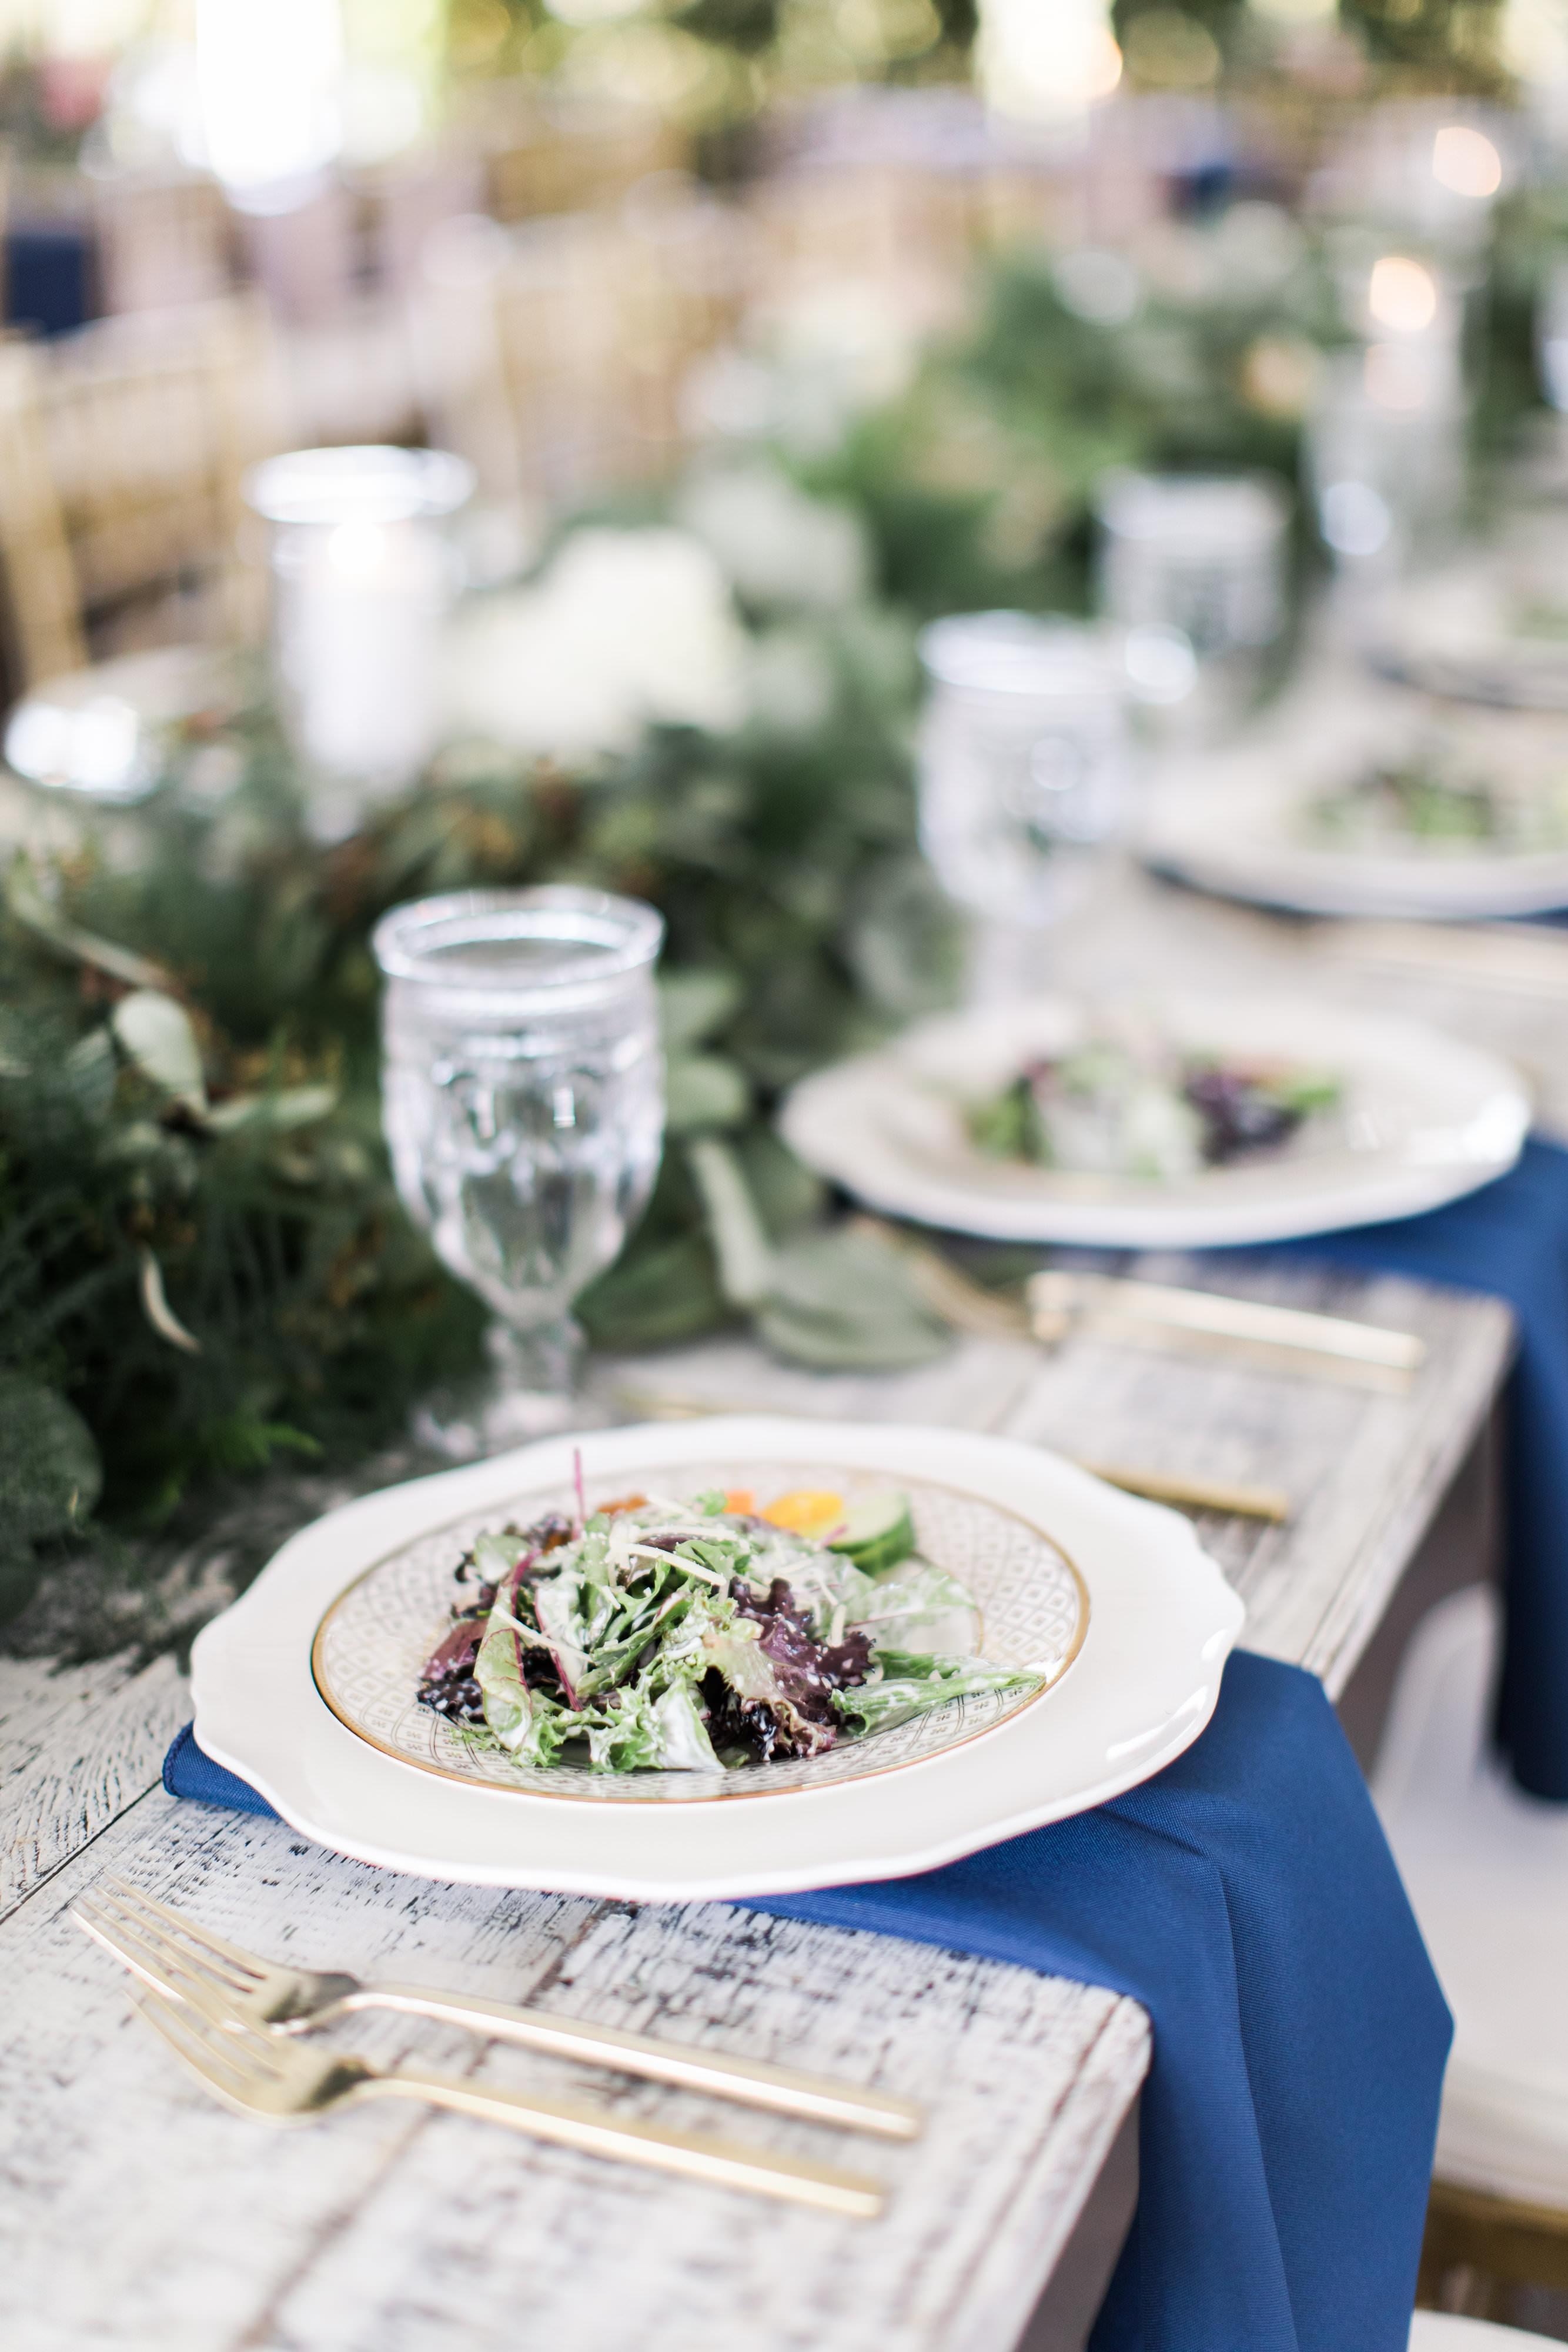 6 Tips for Choosing Your Wedding Vendors | vendor team, dream team, wedding team, hiring wedding pros, contracting wedding vendors